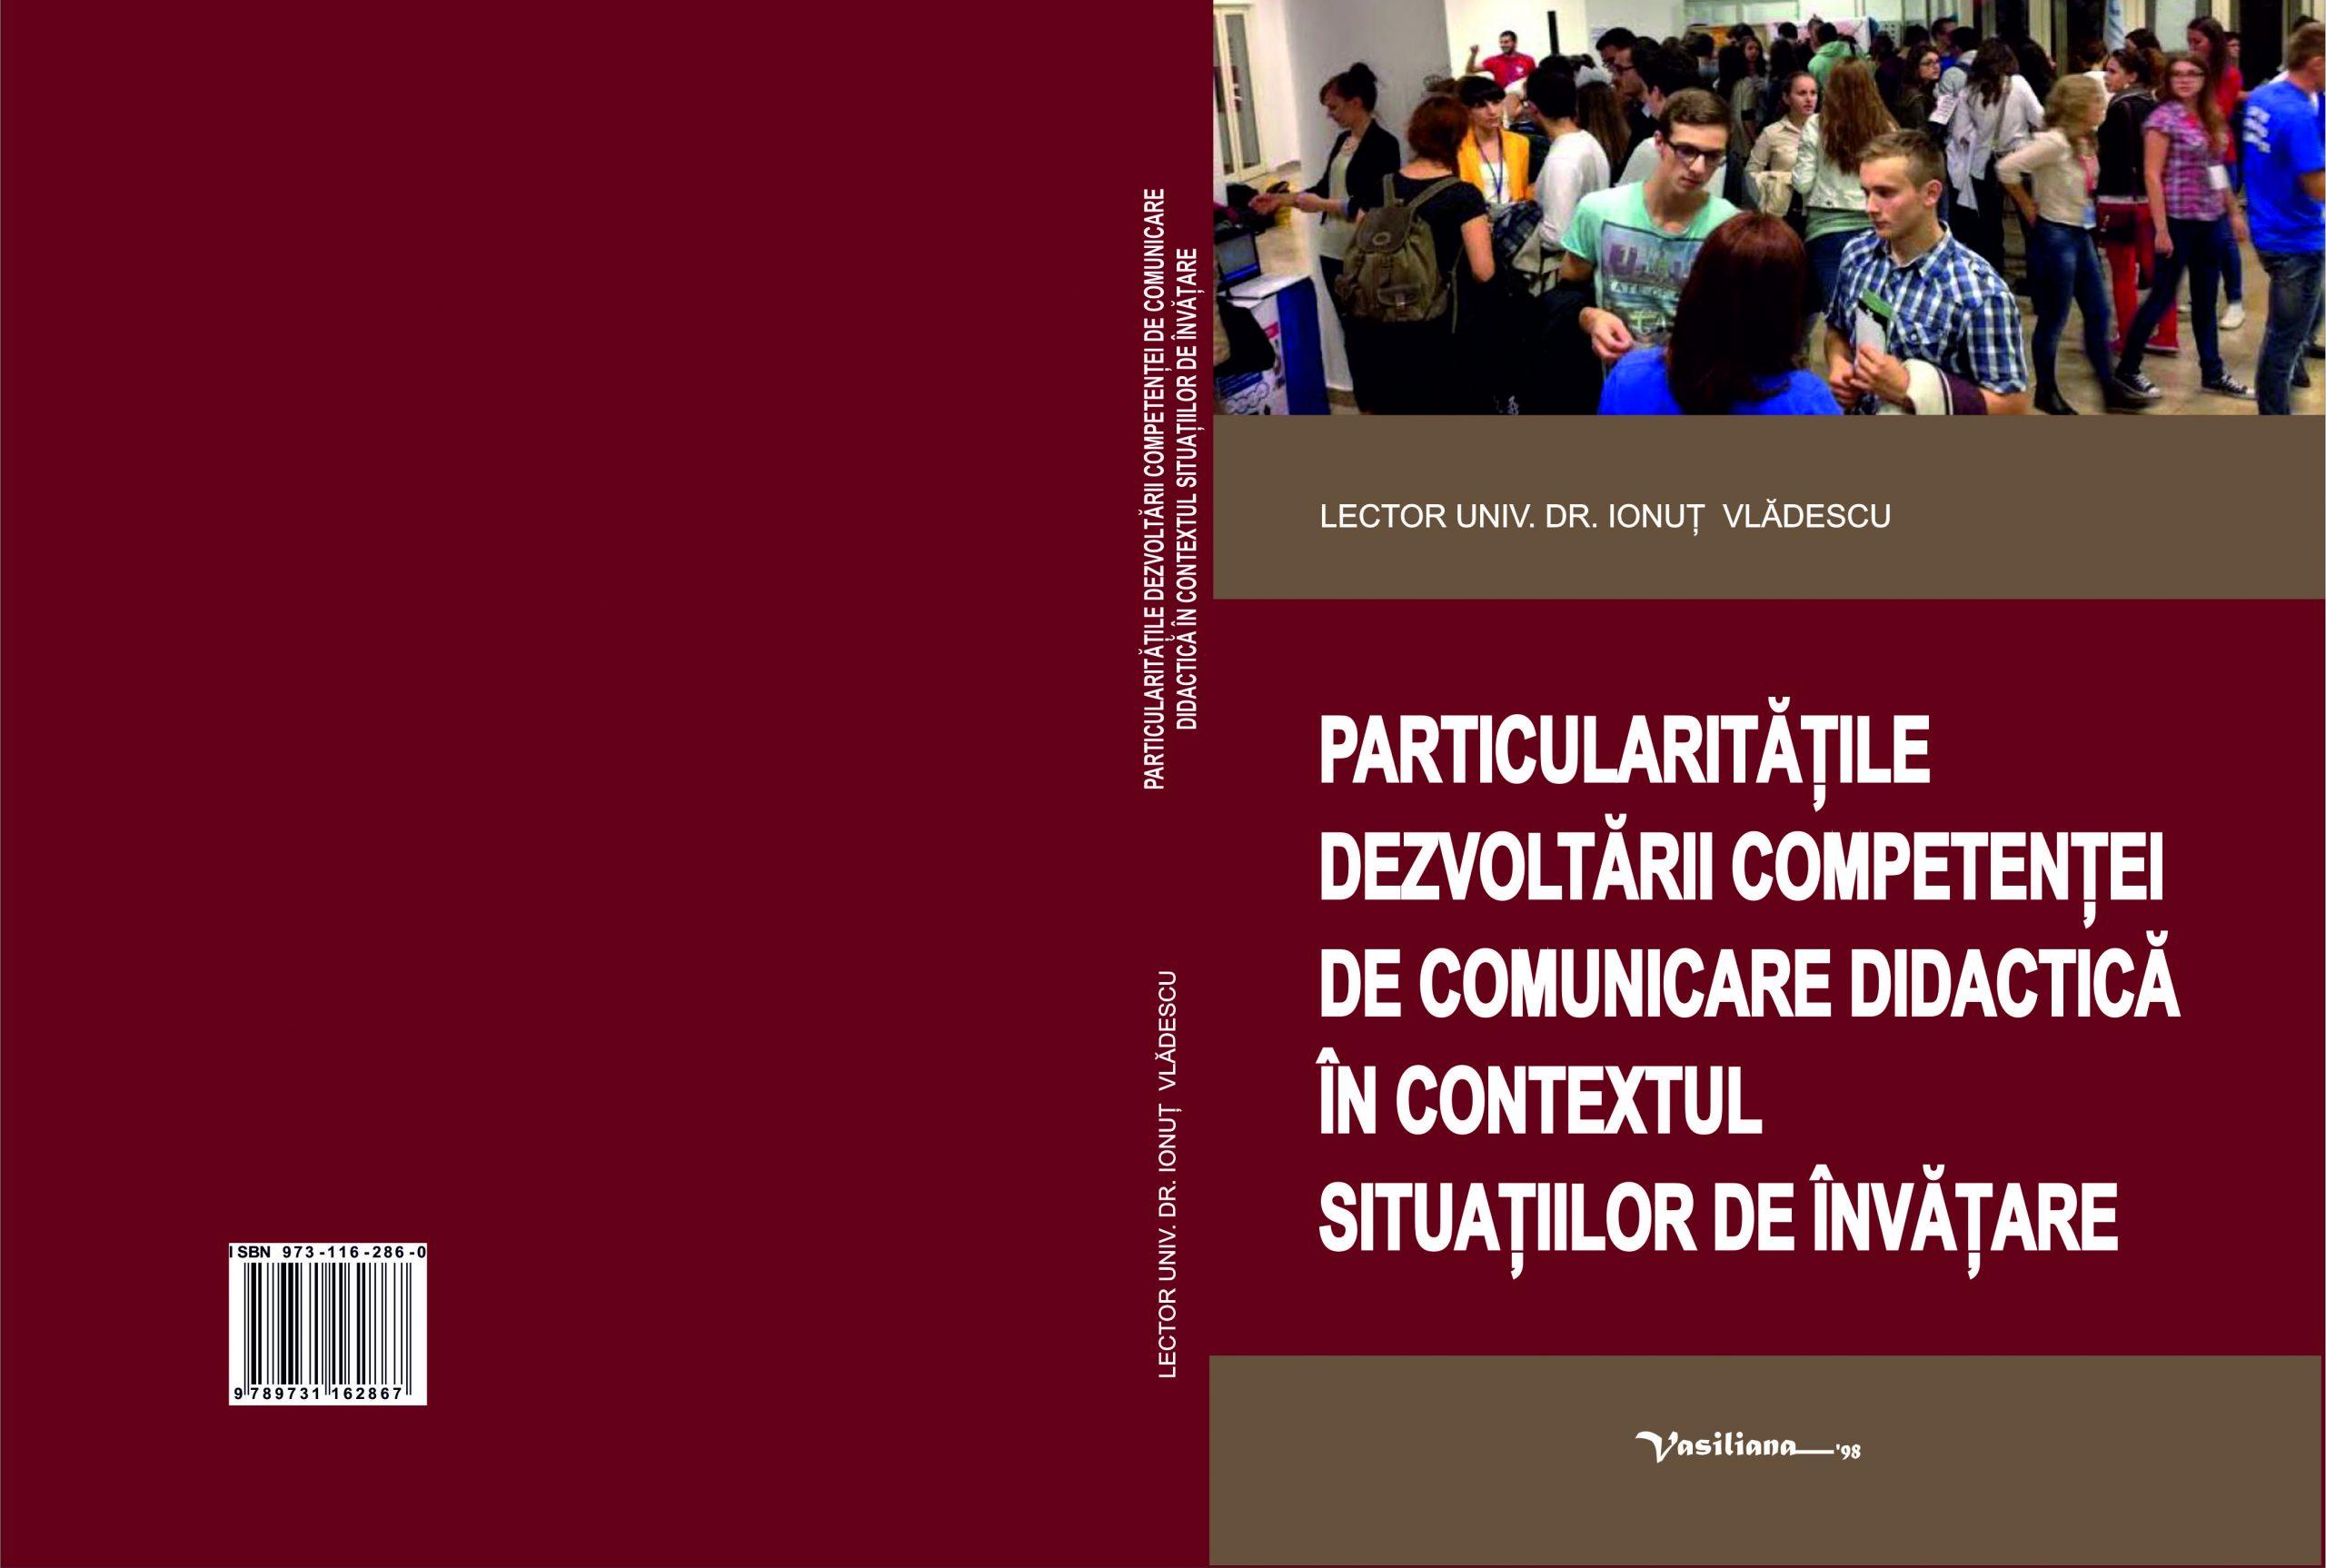 Particularitatile dezvoltarii competentei de comunicare didactica in contextul situatiilor de invatare